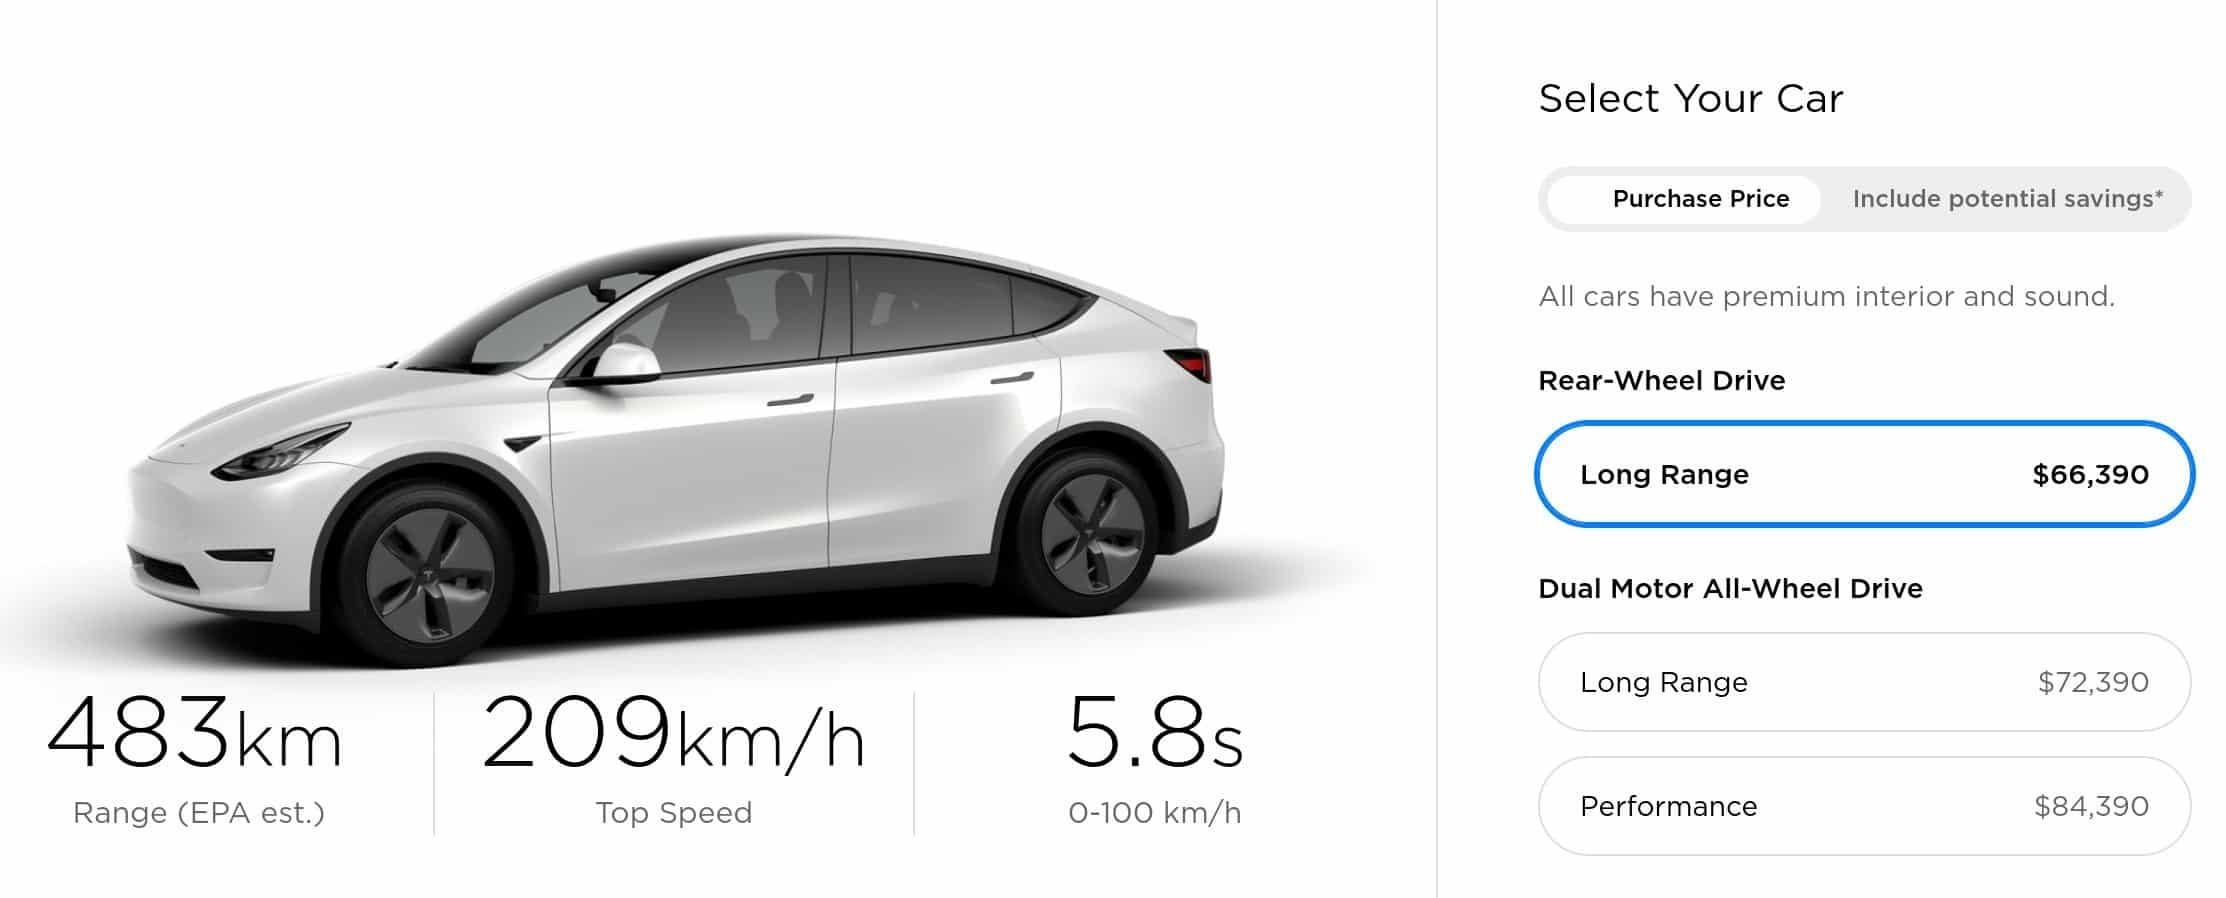 2019 Tesla Model Y is a great electric car deal